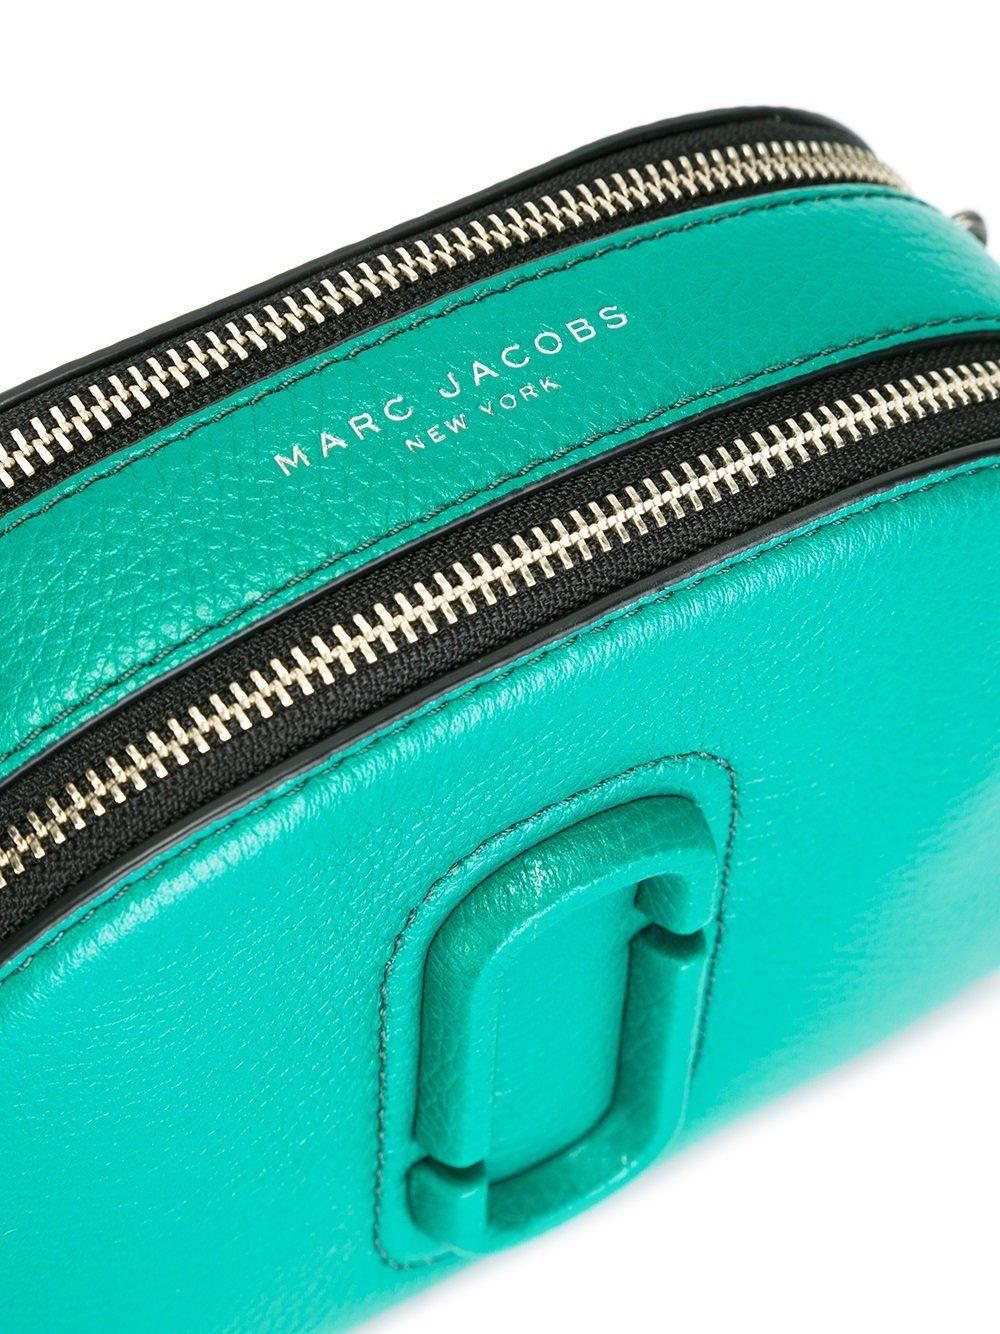 4c5871c7aa0a Marc Jacobs small Shutter Camera bag